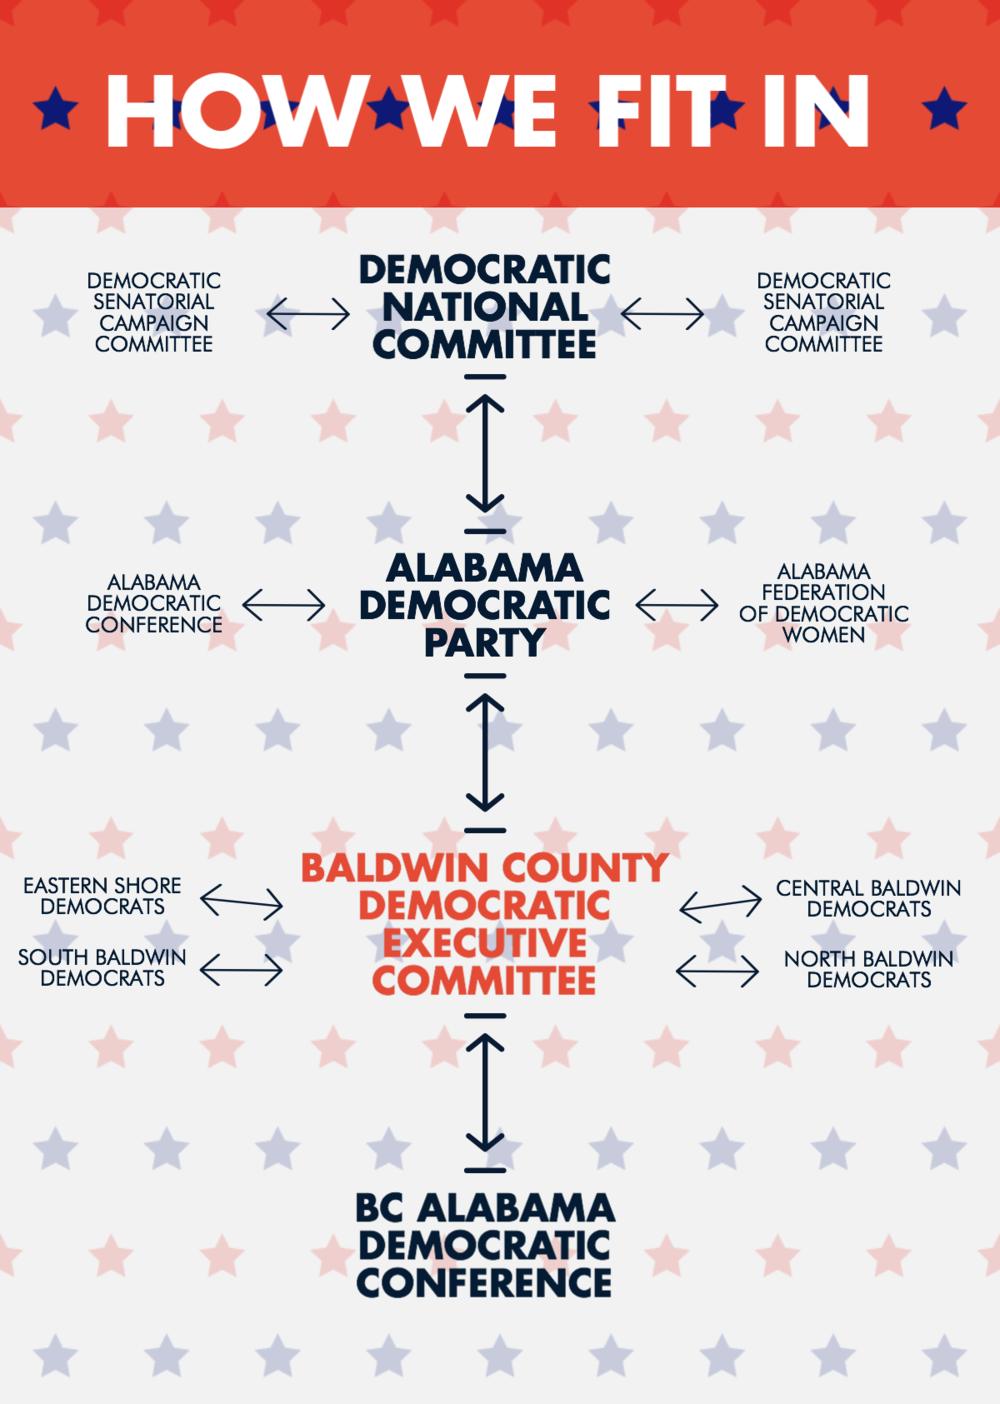 baldwin-county-alabama-democrats